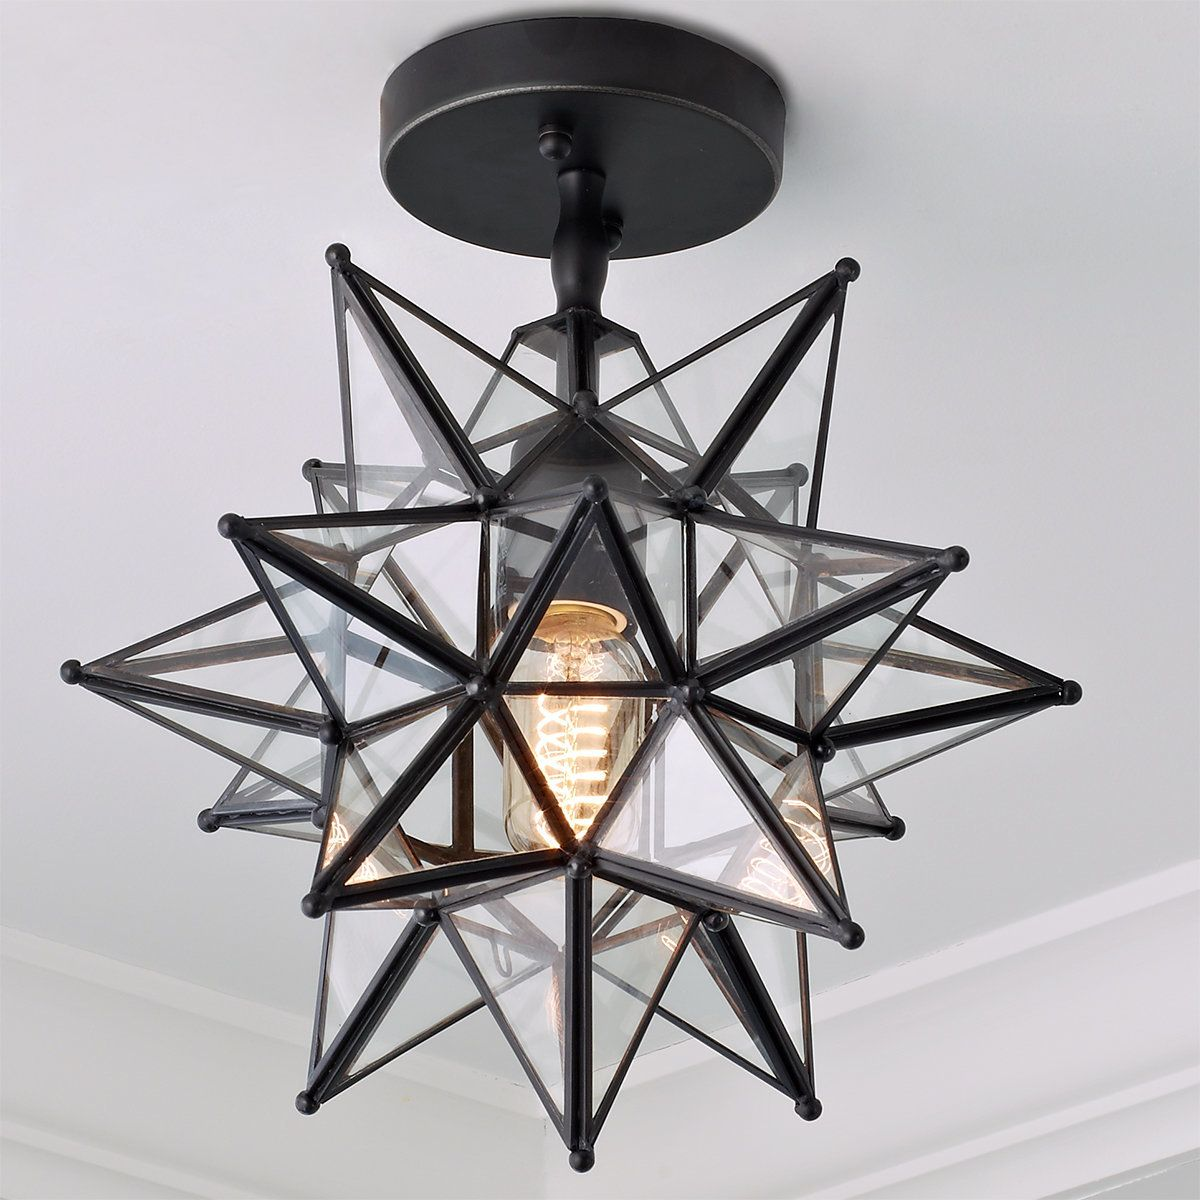 Moravian Star Ceiling Light In 2021 Star Lights On Ceiling Star Ceiling Ceiling Lights